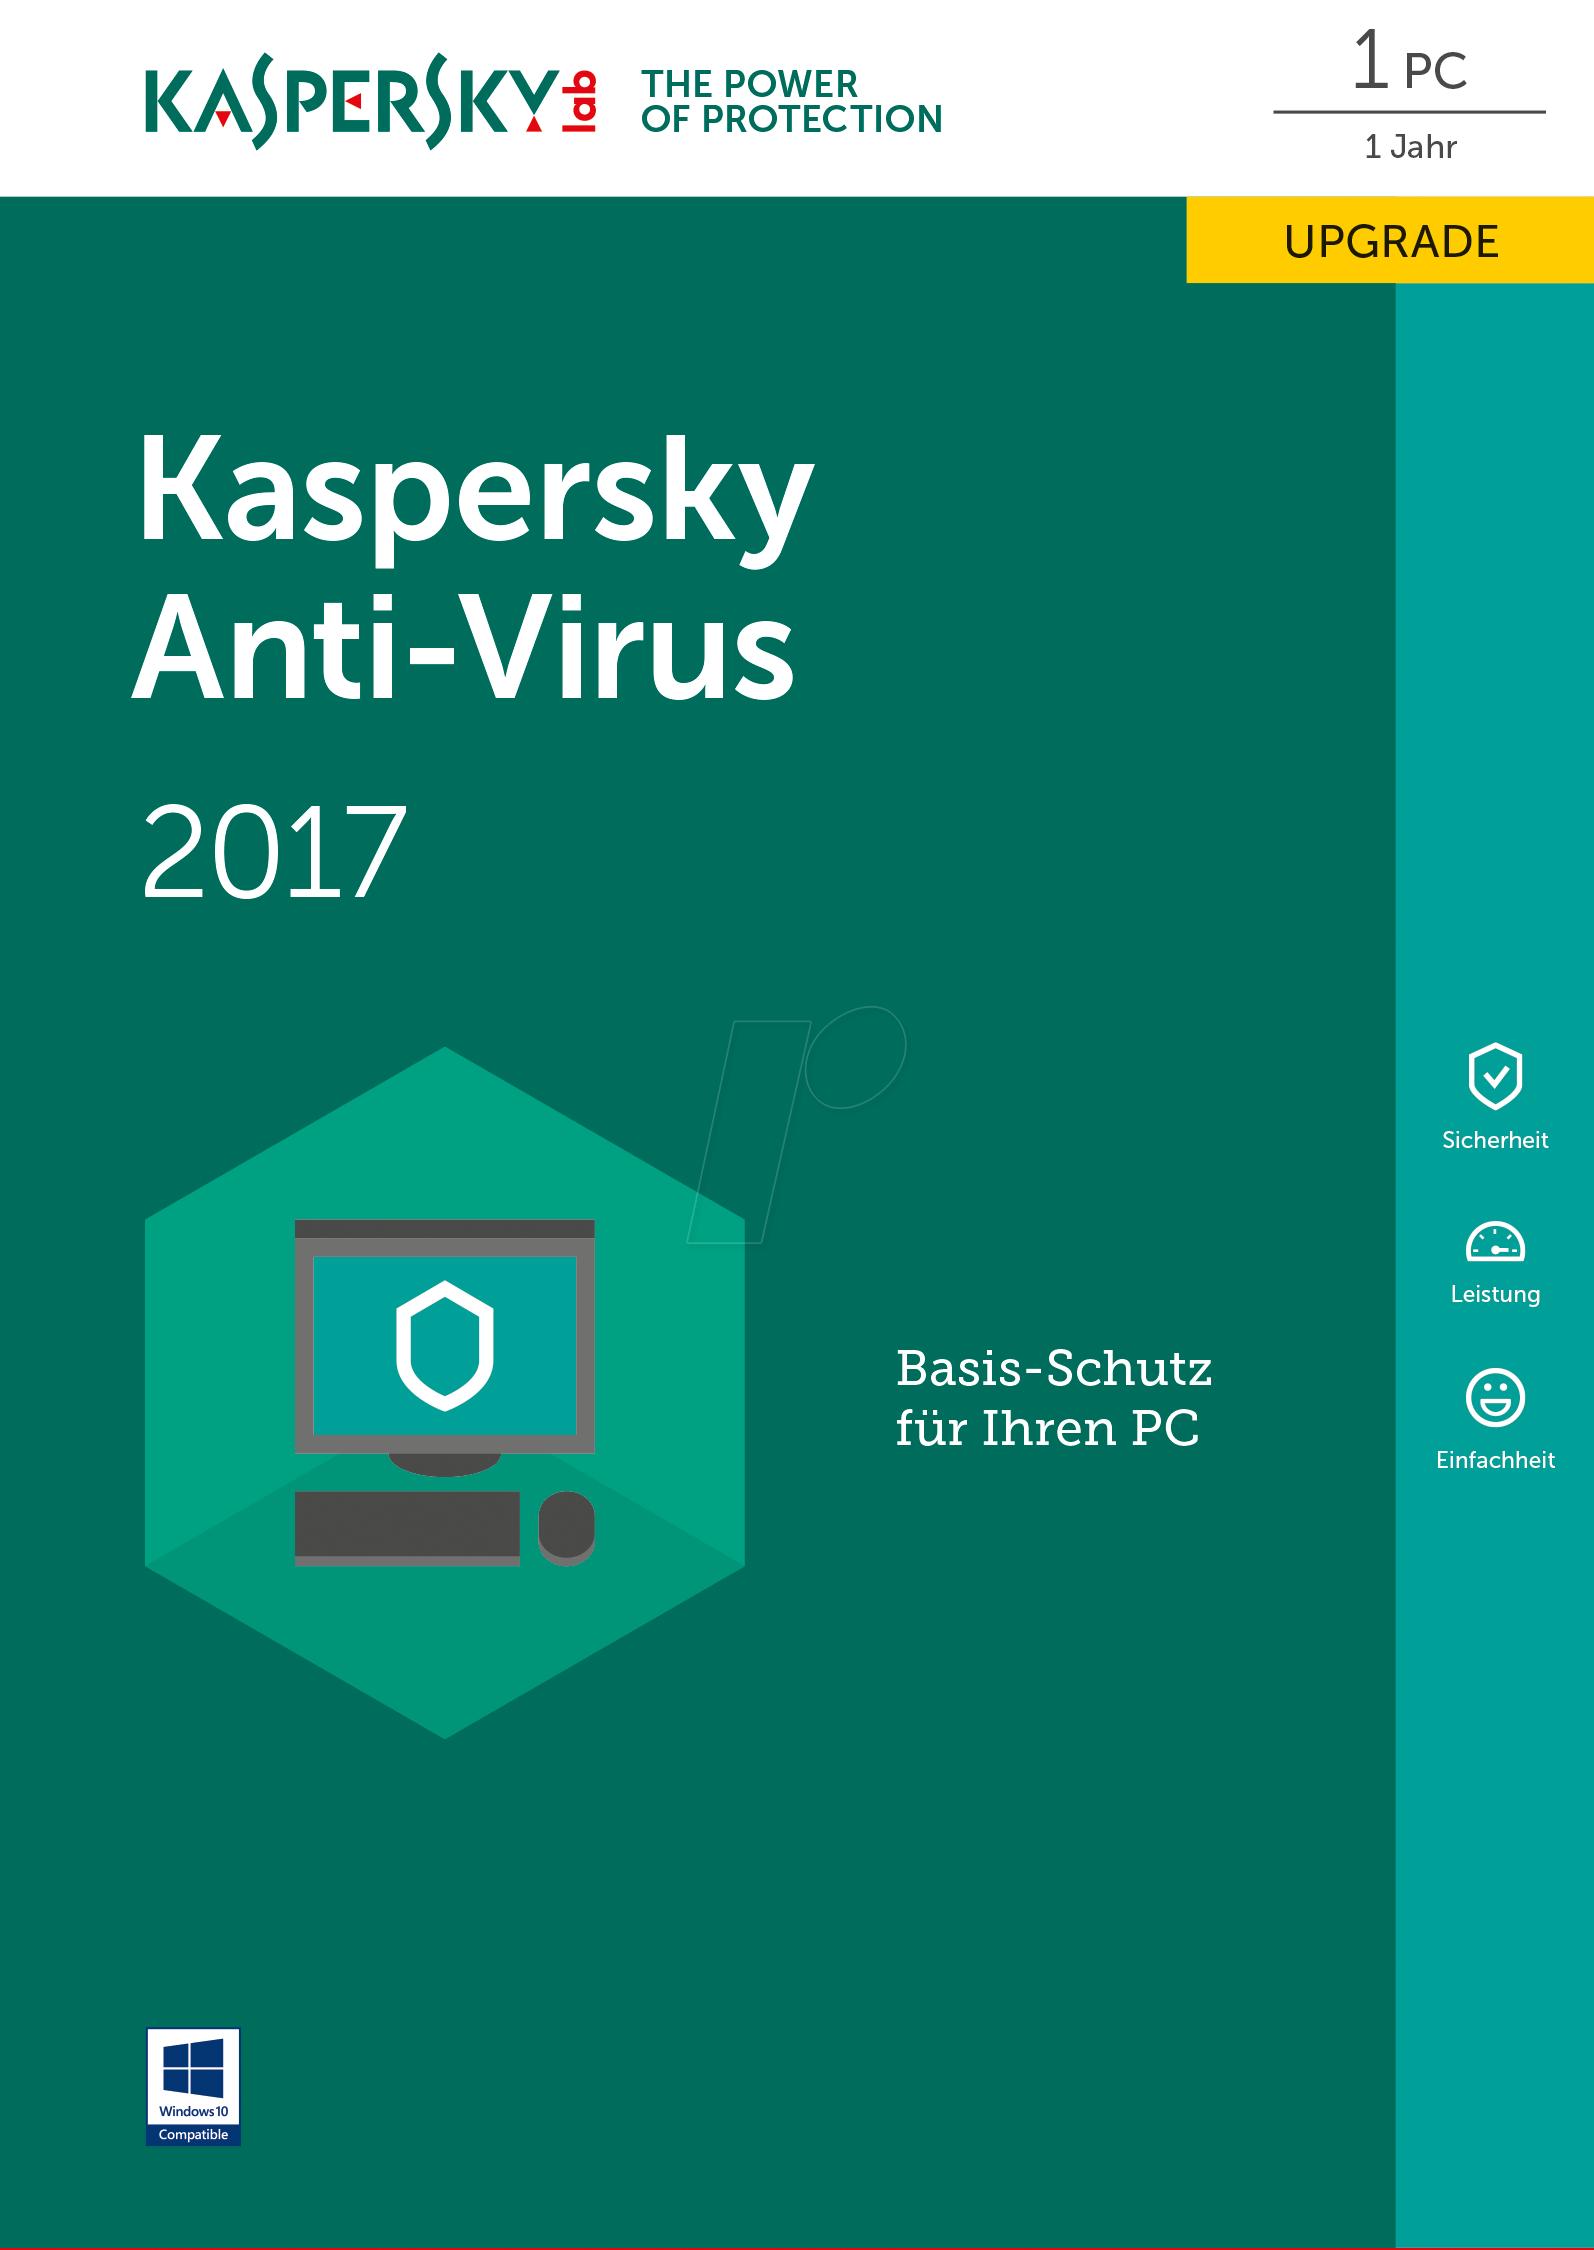 https://cdn-reichelt.de/bilder/web/xxl_ws/G500/KASPERSKY_AV2017_UPG_02.png